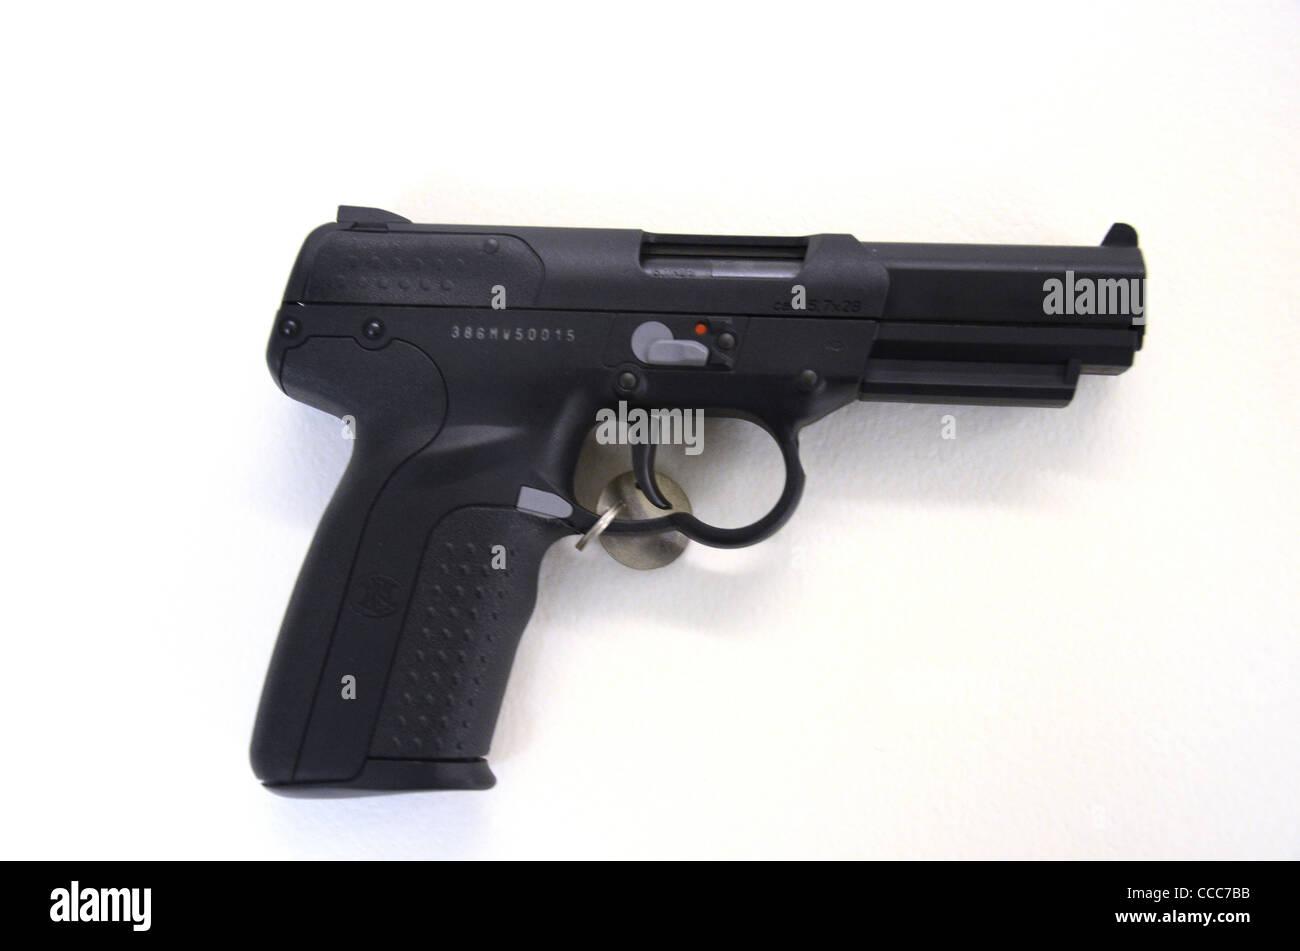 FN 5 SEPT 1995 PISTOLET TACTIQUE Photo Stock